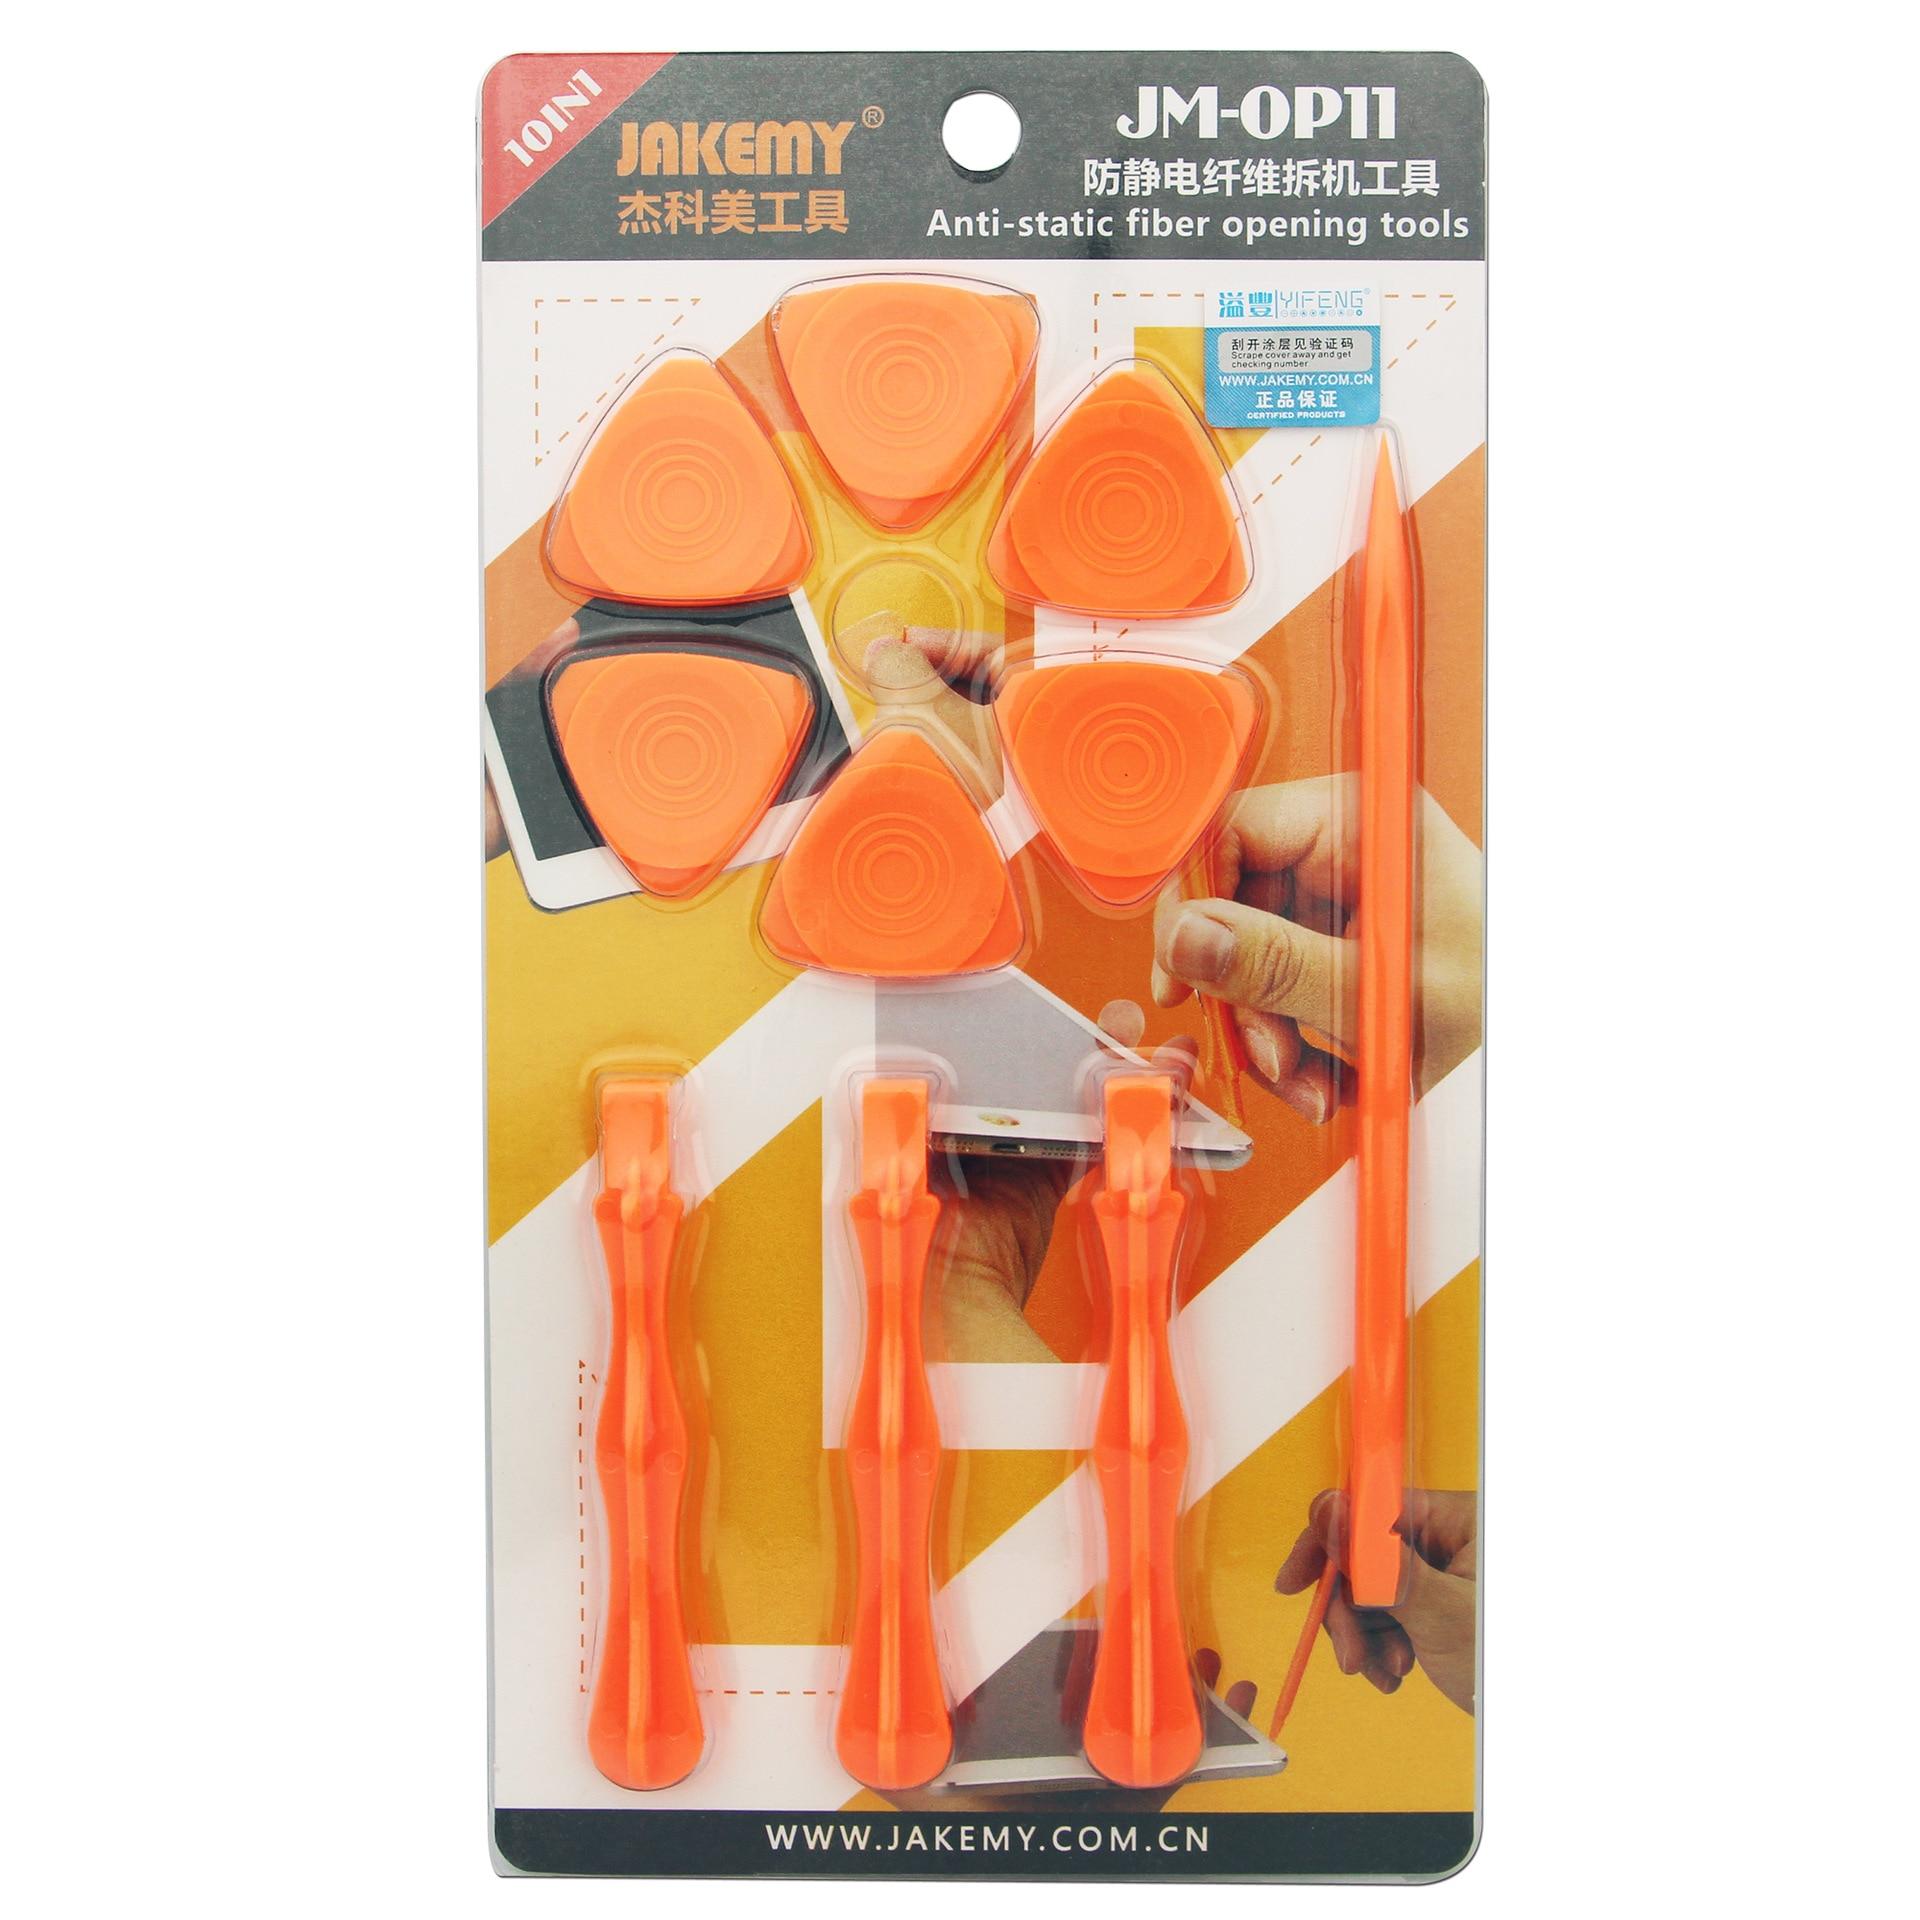 Disassembling Tools Suit 10 Pieces Comfortable Triangular Bending Boot Disk Crowbar  Crowbar iPhone Startup Tool|Garage Door Hardware|   - title=